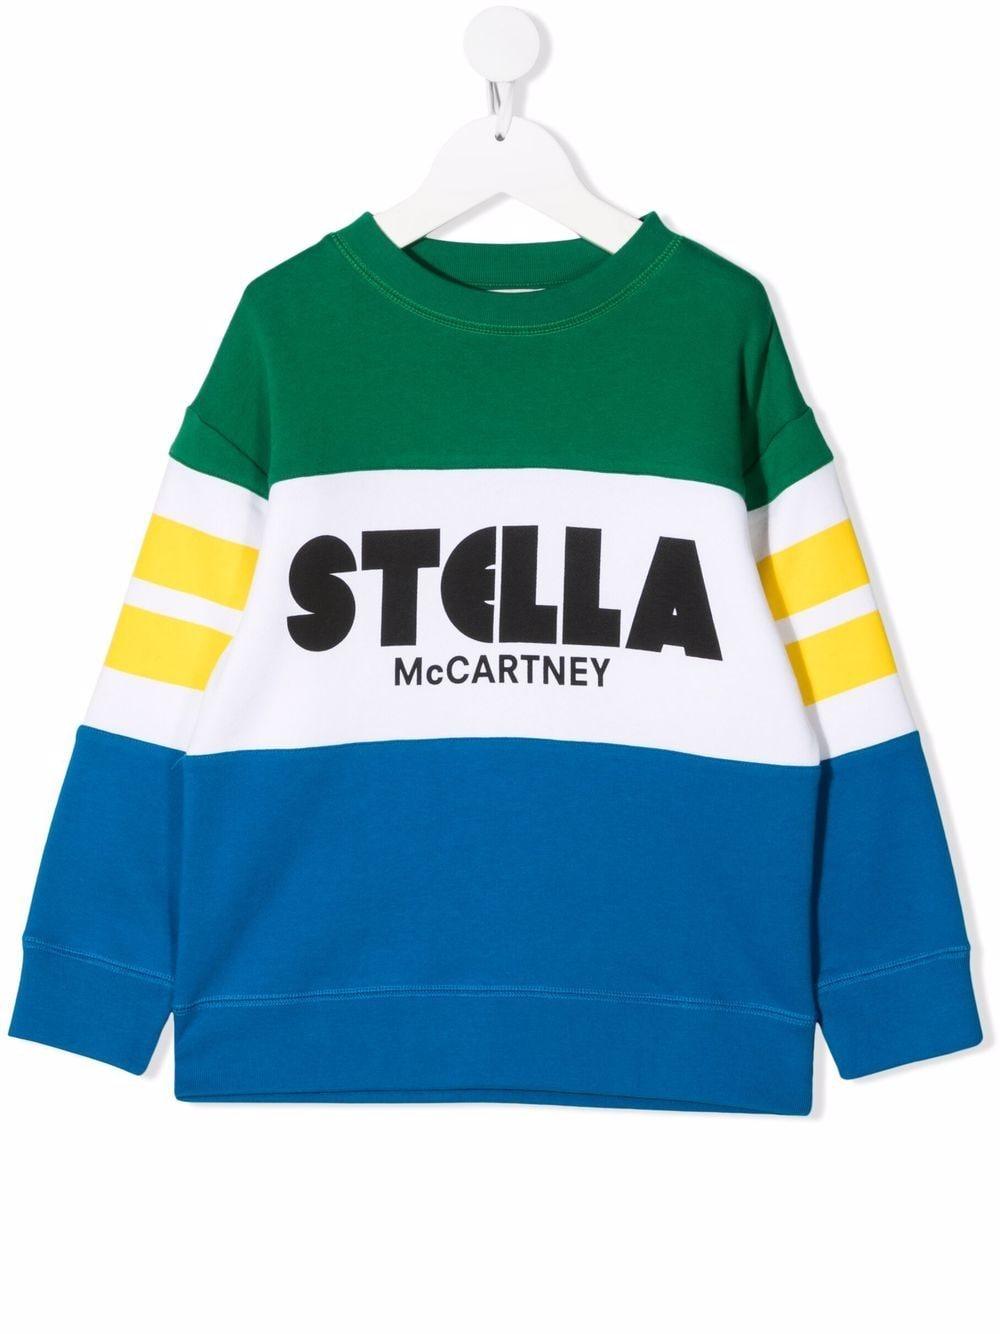 Felpa Stella McCartney kids STELLA MCCARTNEY KIDS | -108764232 | 602248SRJ708490